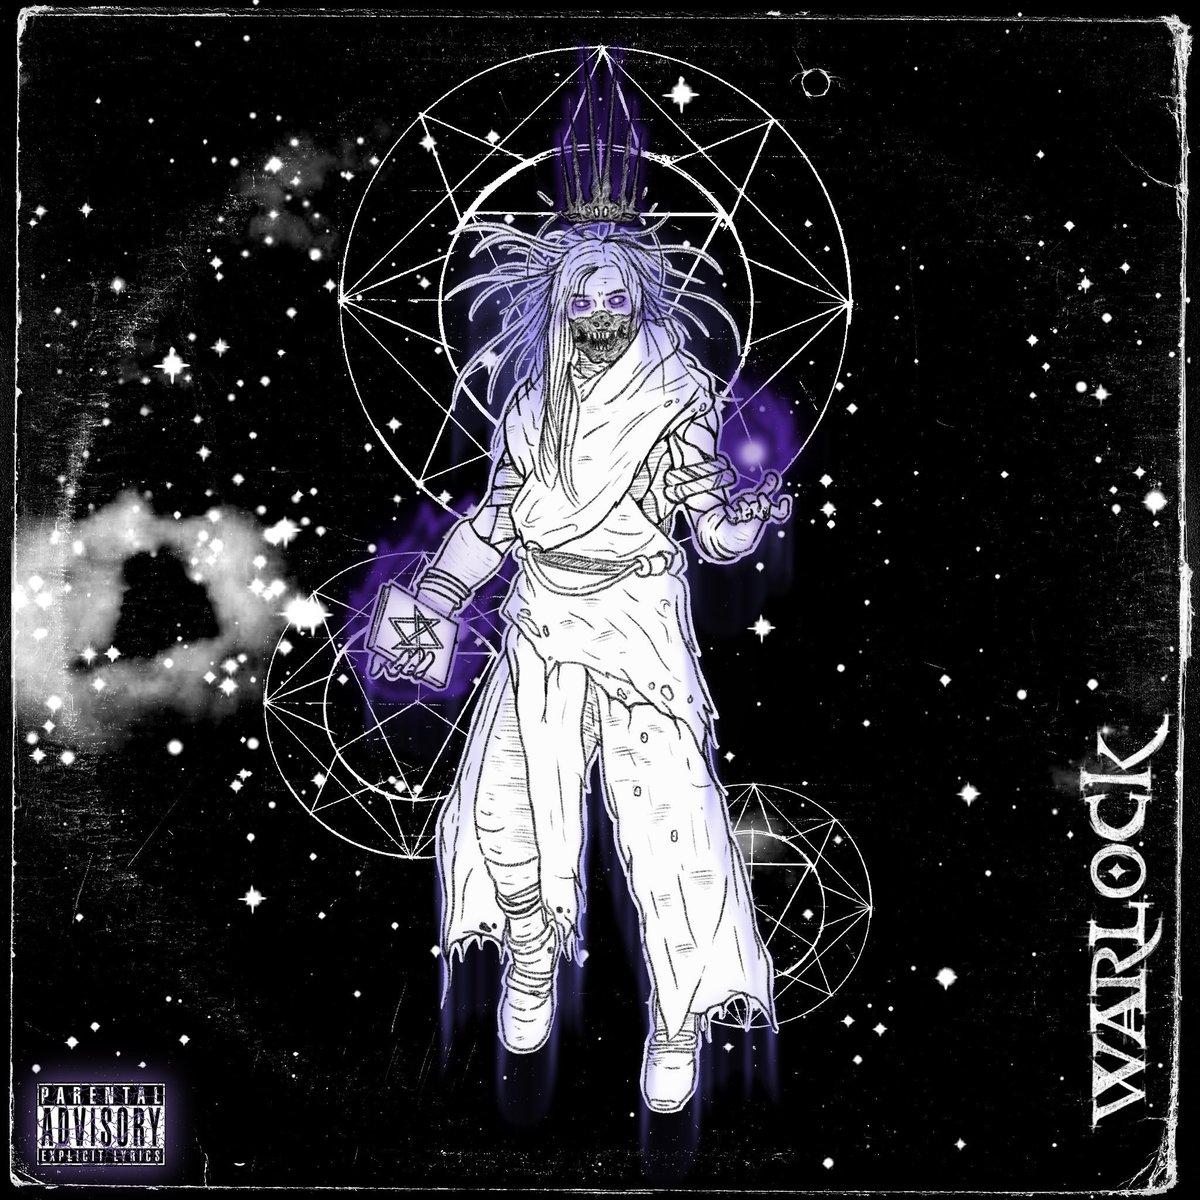 warlock no ccr.jpg